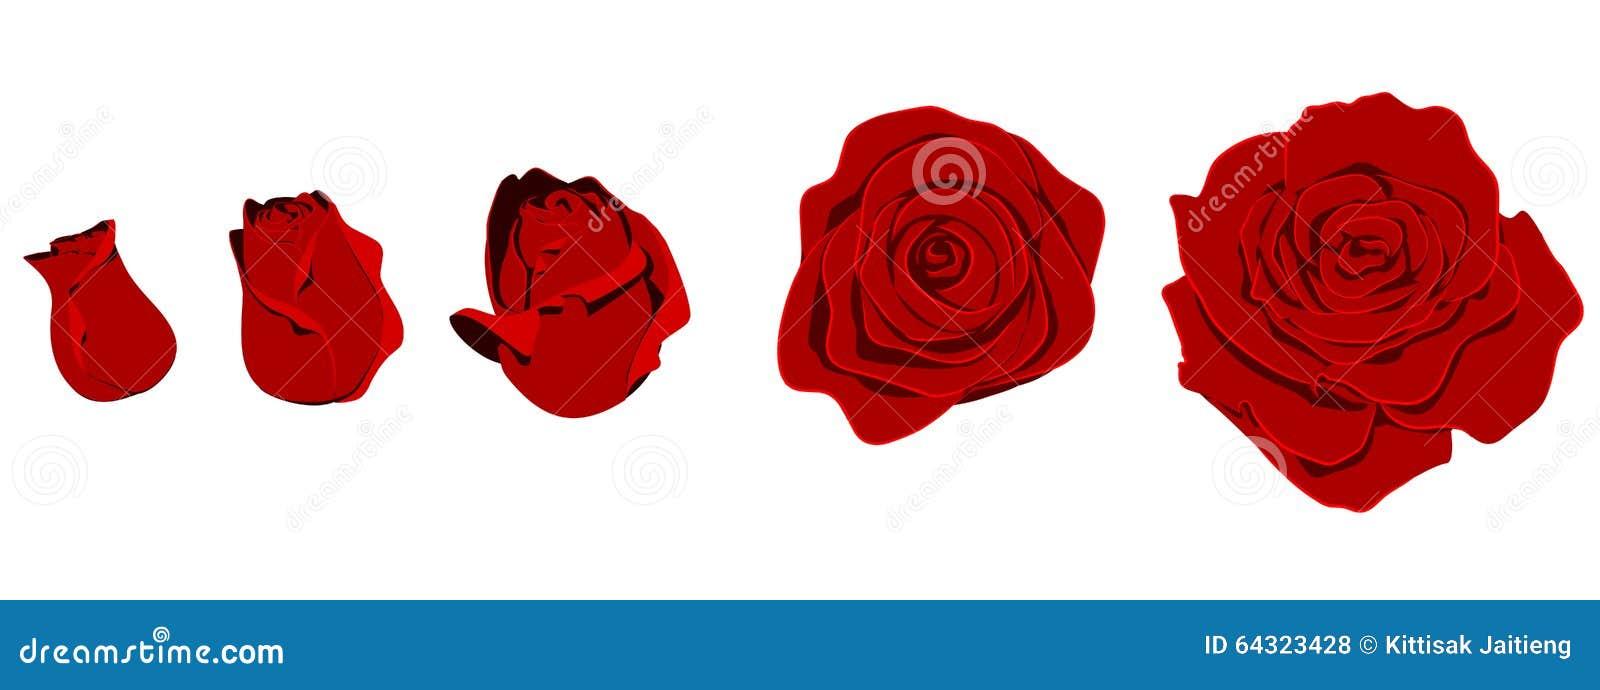 rose shape stock vector illustration of bloom clear 64323428